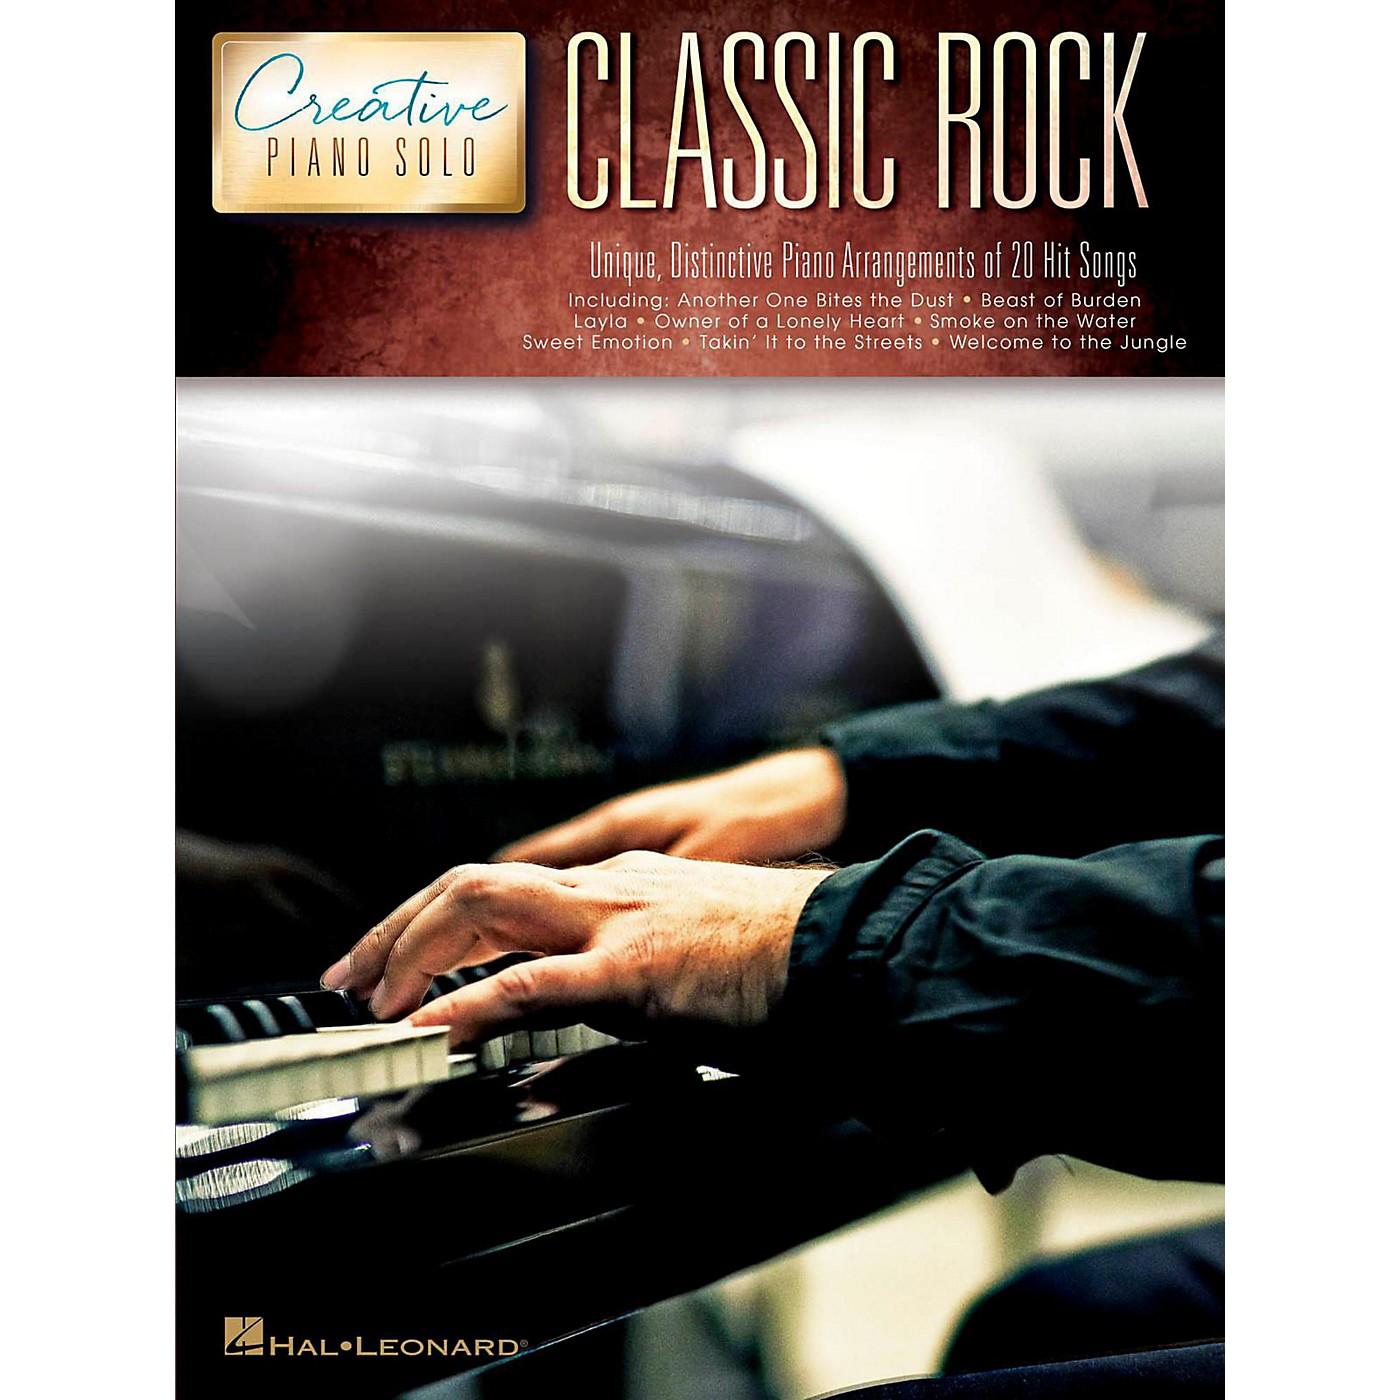 Hal Leonard Classic Rock - Creative Piano Solo Songbook thumbnail